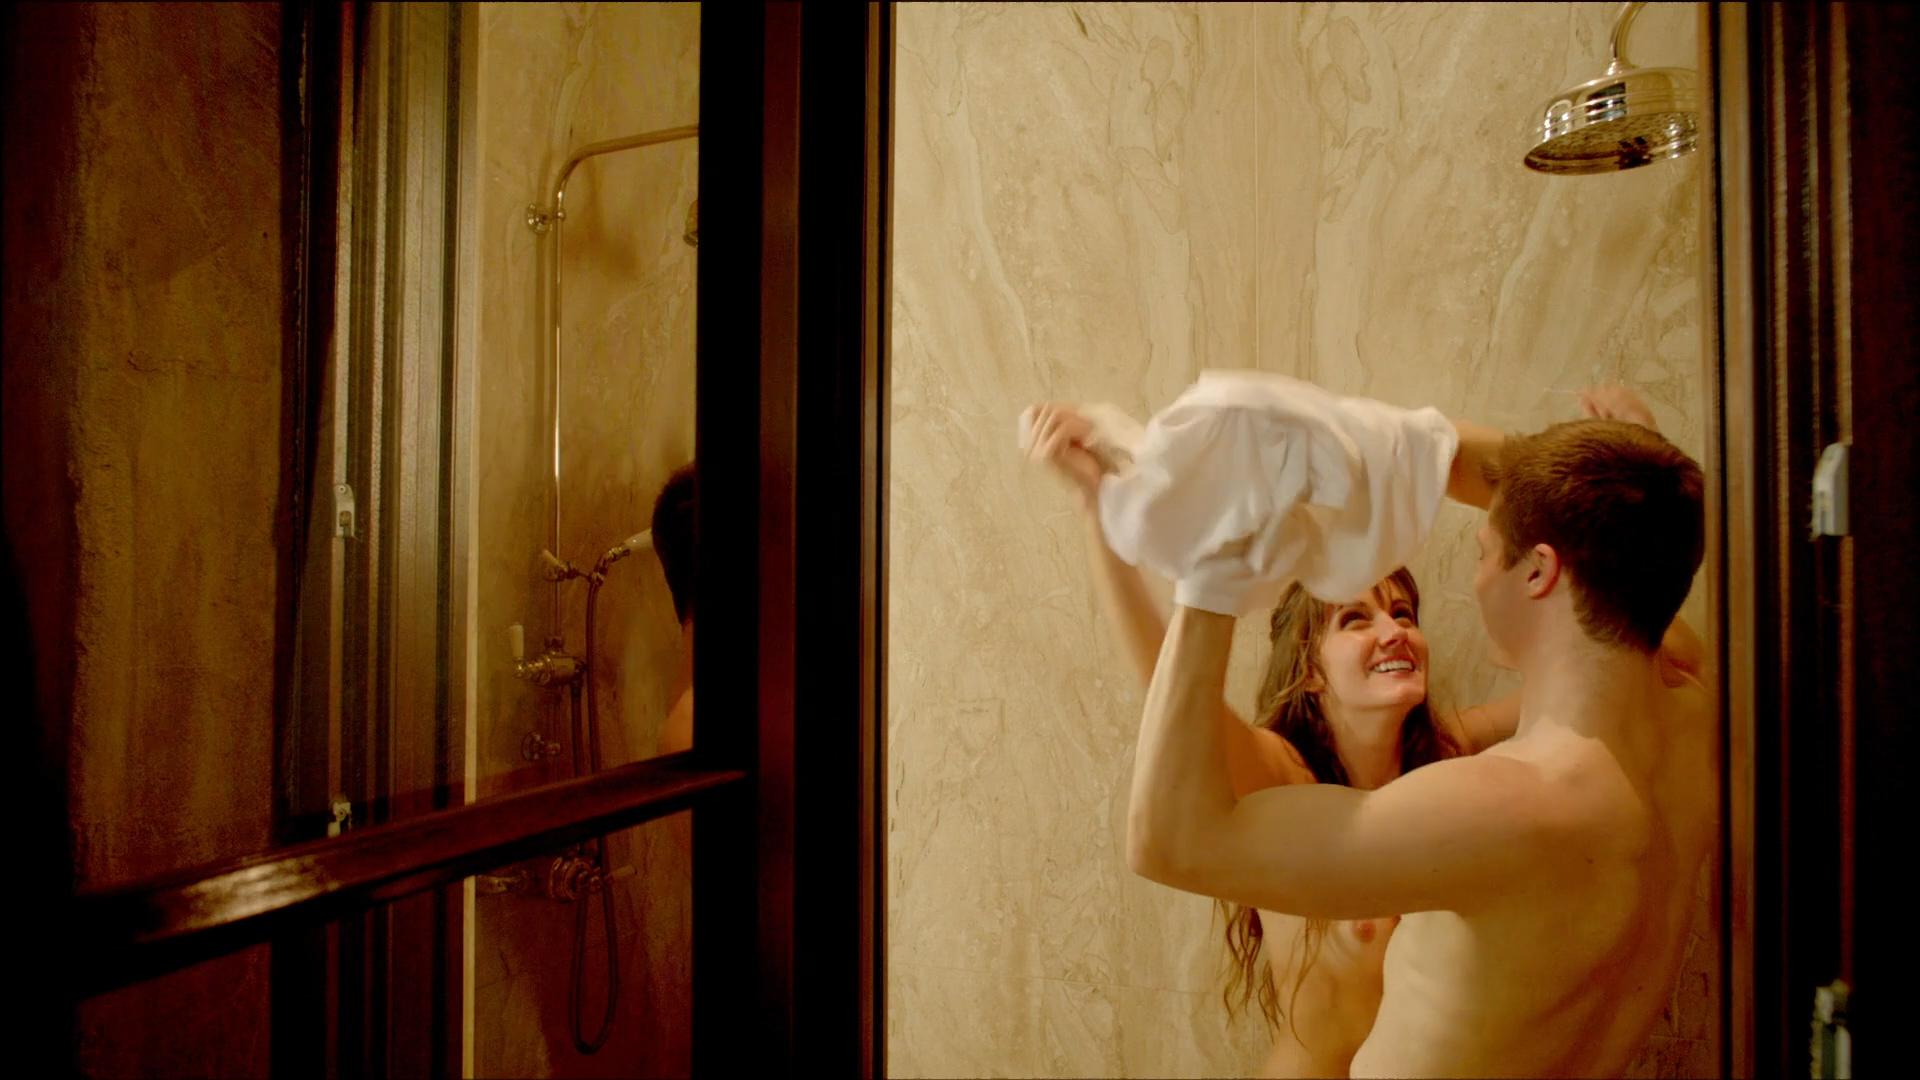 Jena Sims nude sex Mischa Barton hot others nude - American Beach House (2015) hd1080p BluRay (12)